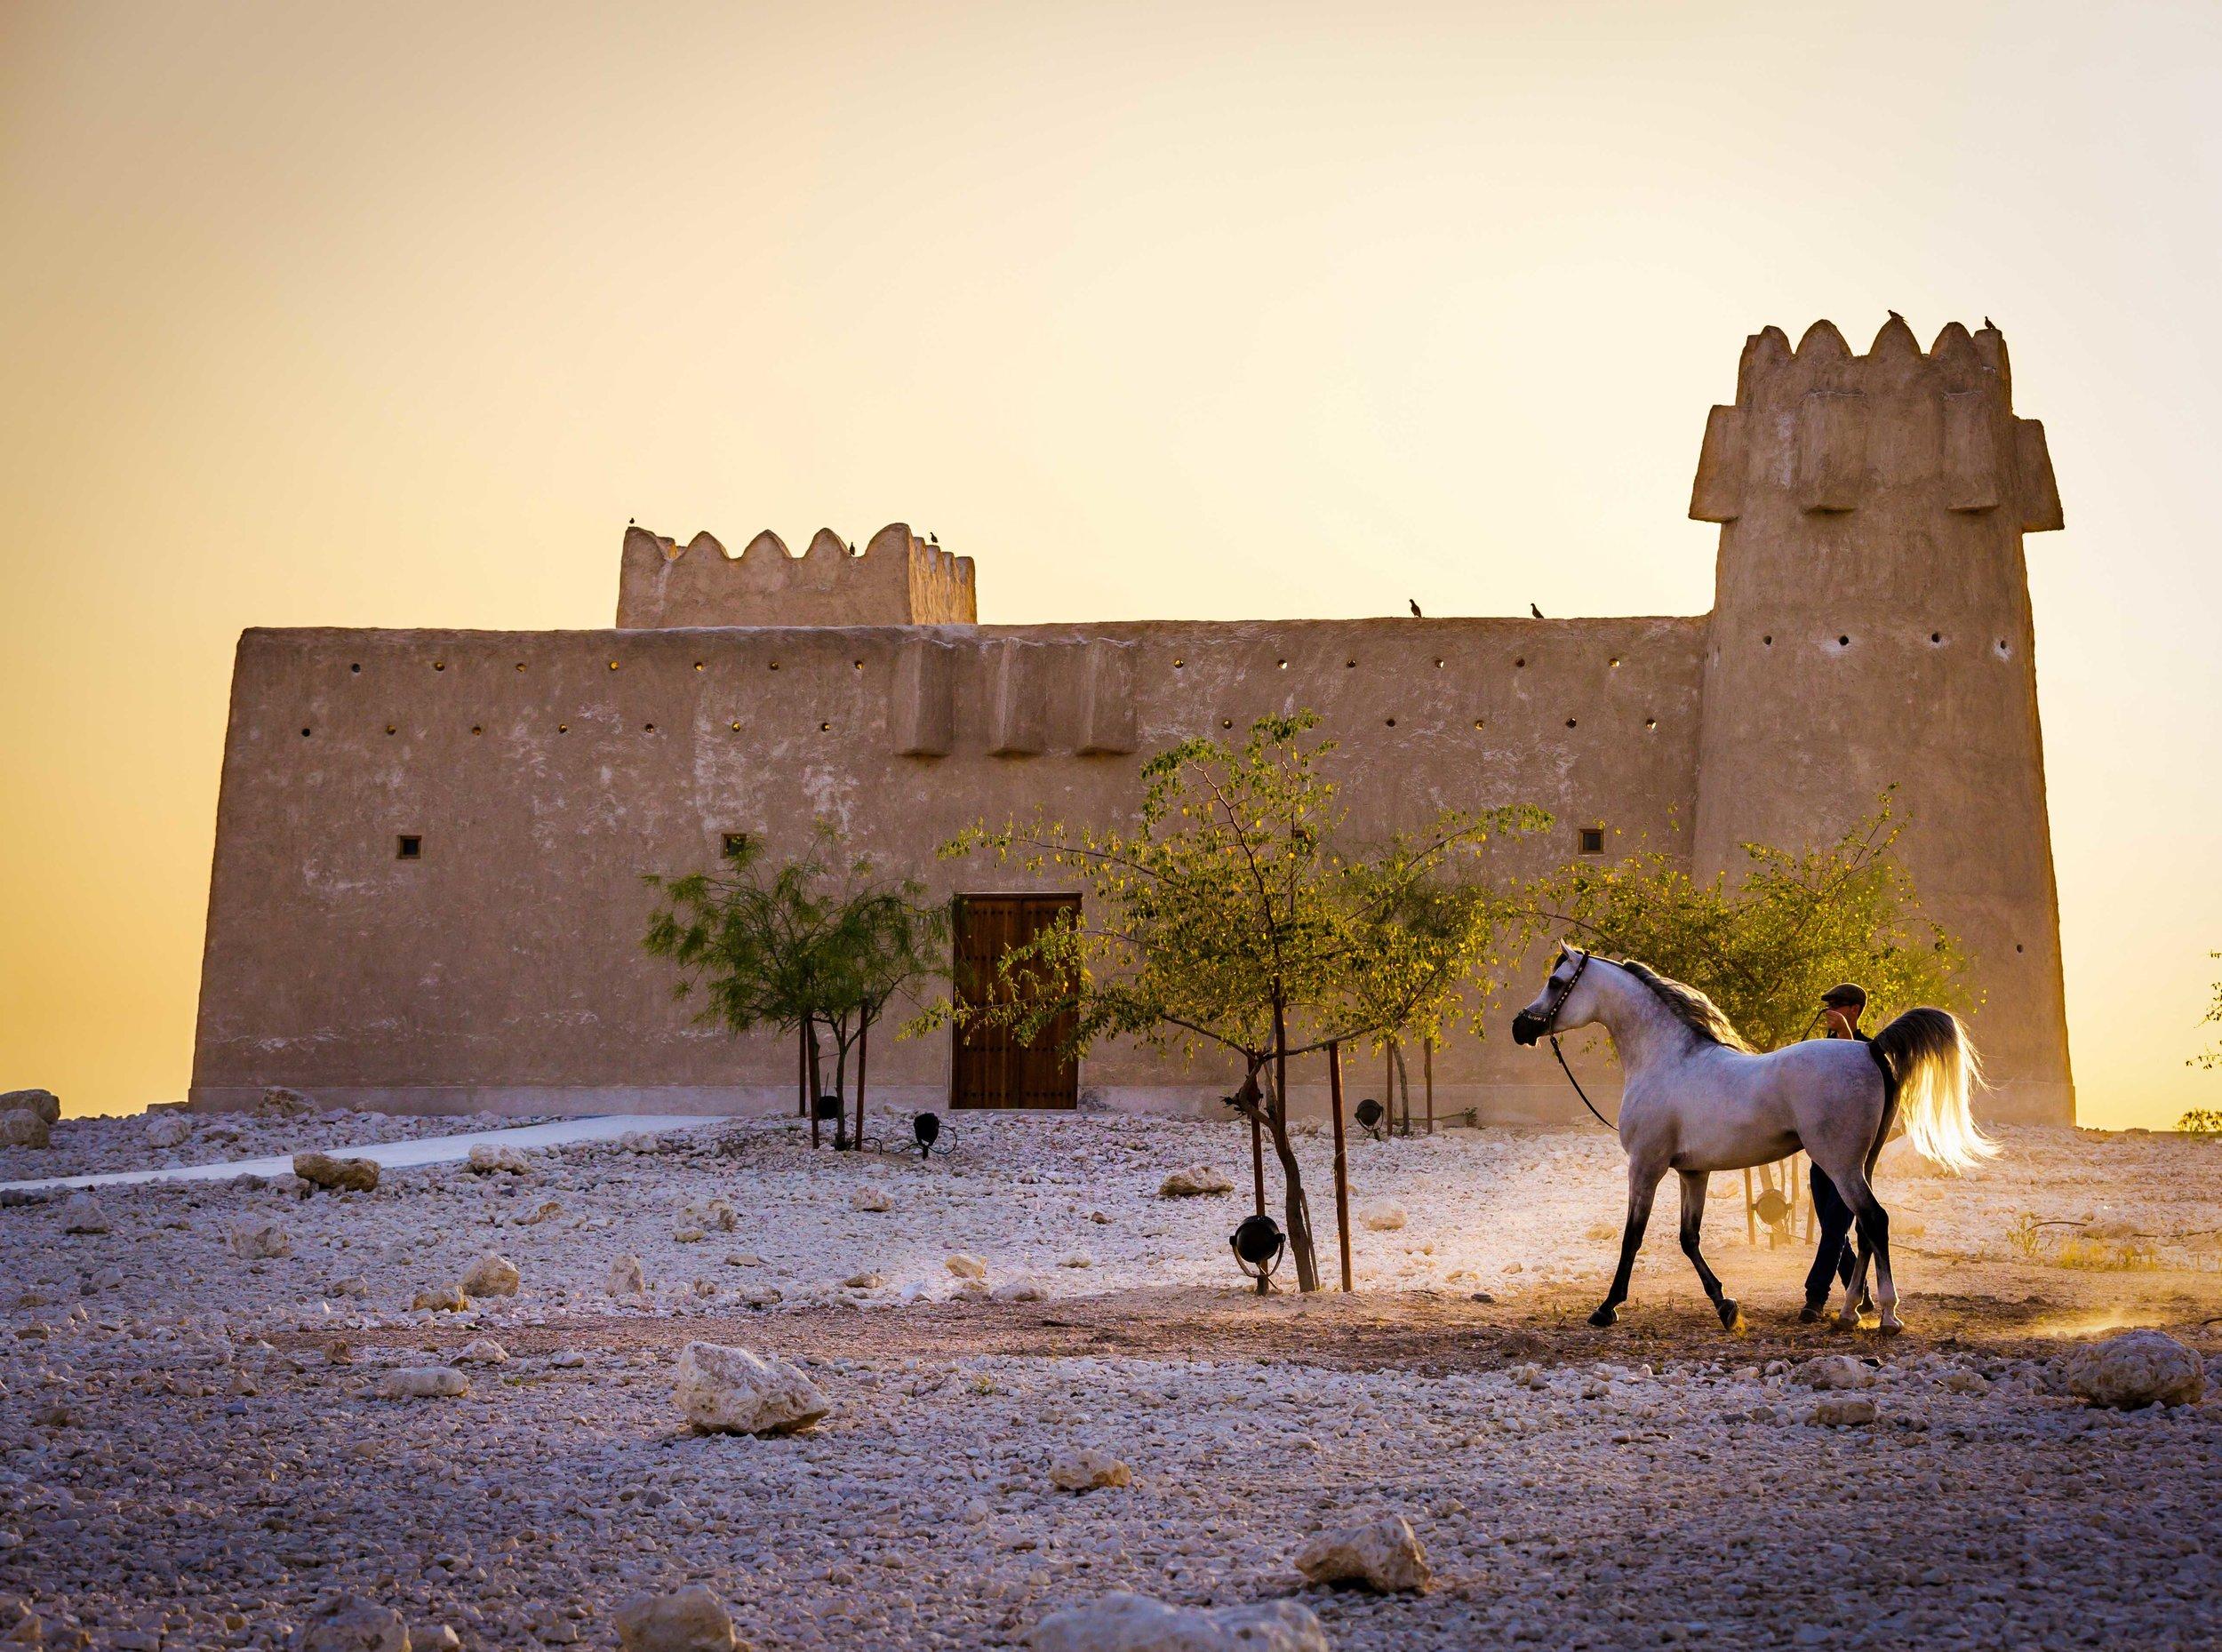 The Arabian Horse Photography